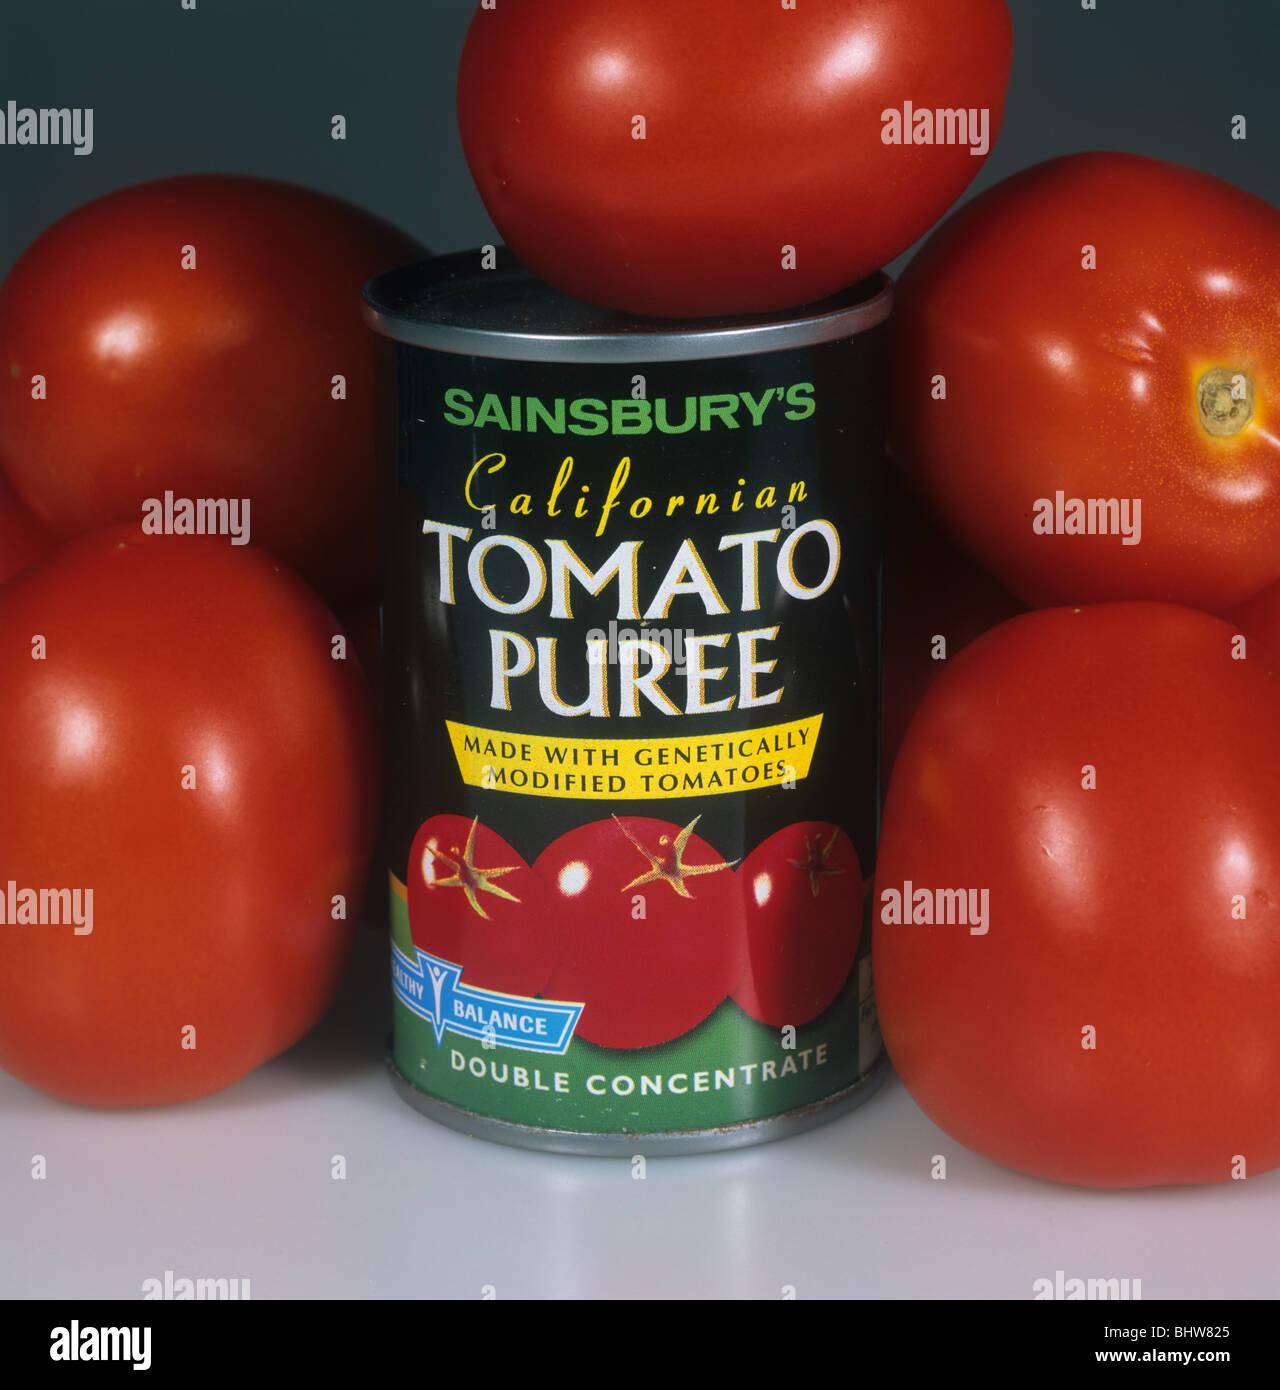 Tin of genetically modified tomato puree with ripe tomato fruit - Stock Image